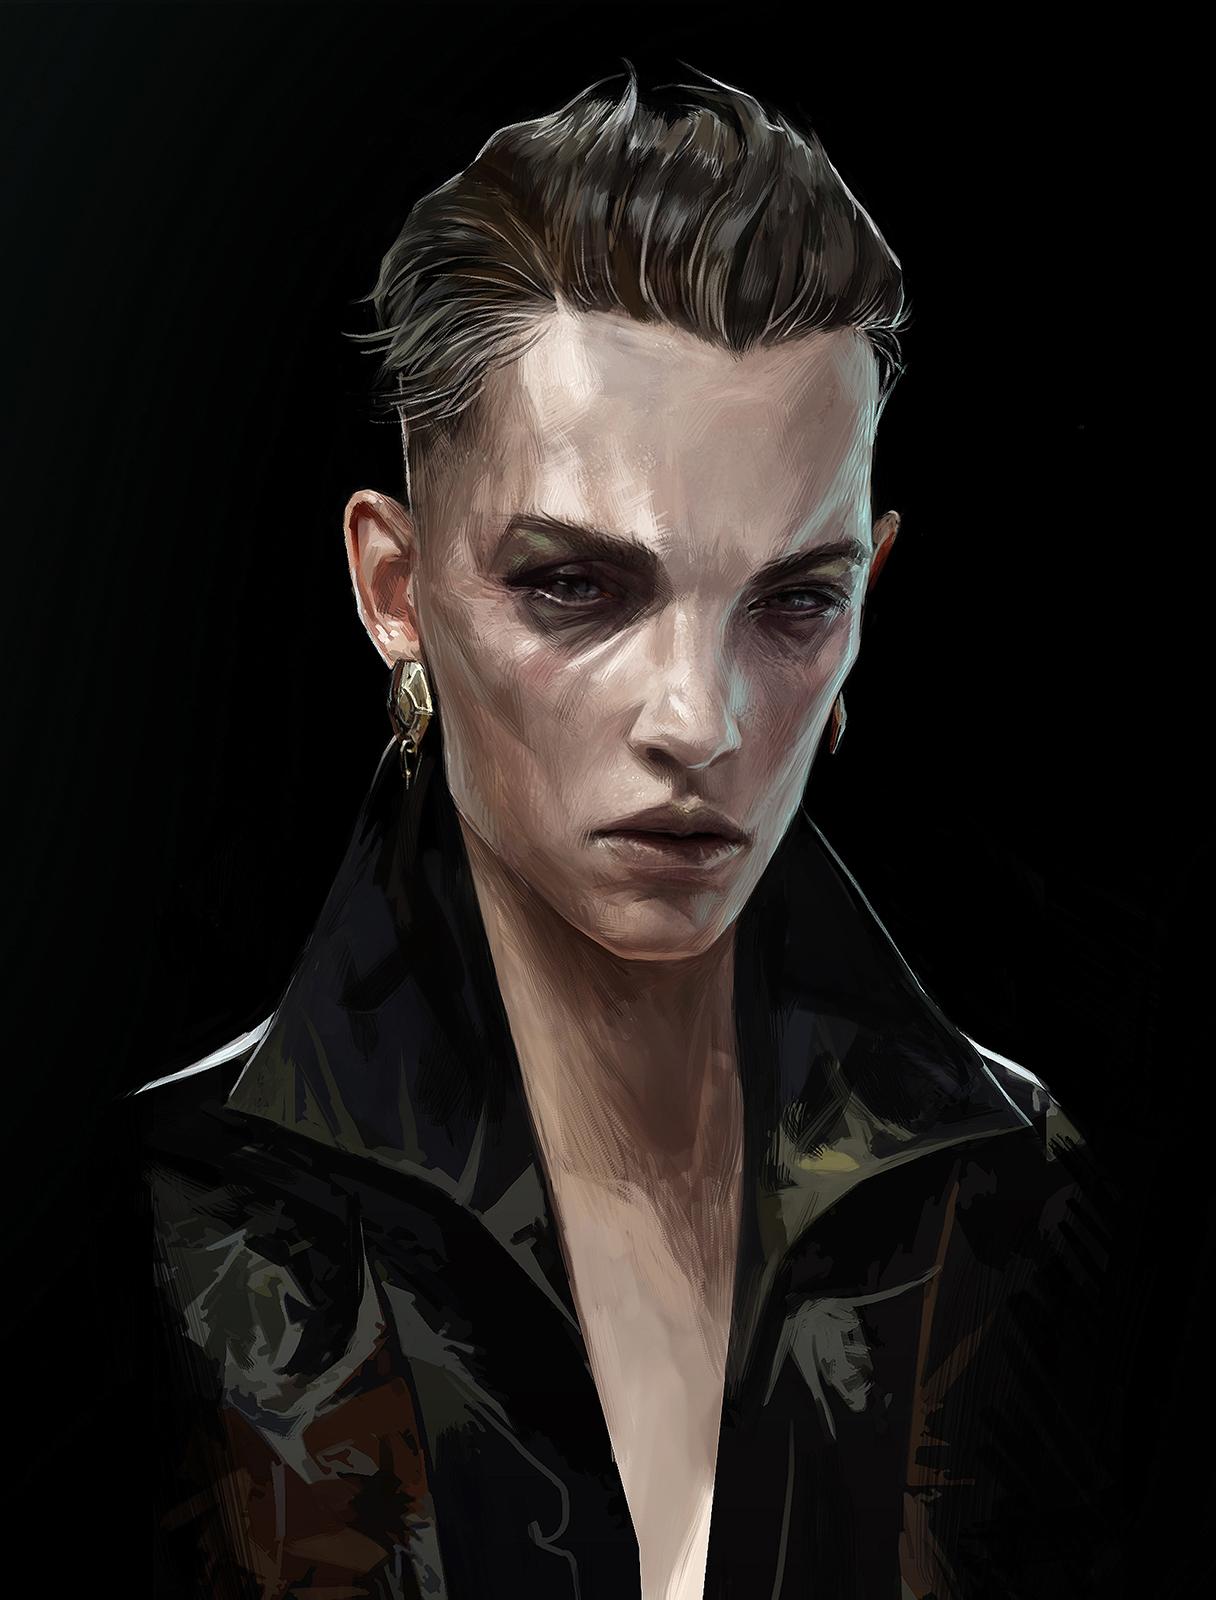 artwork delilah portrait dishonored